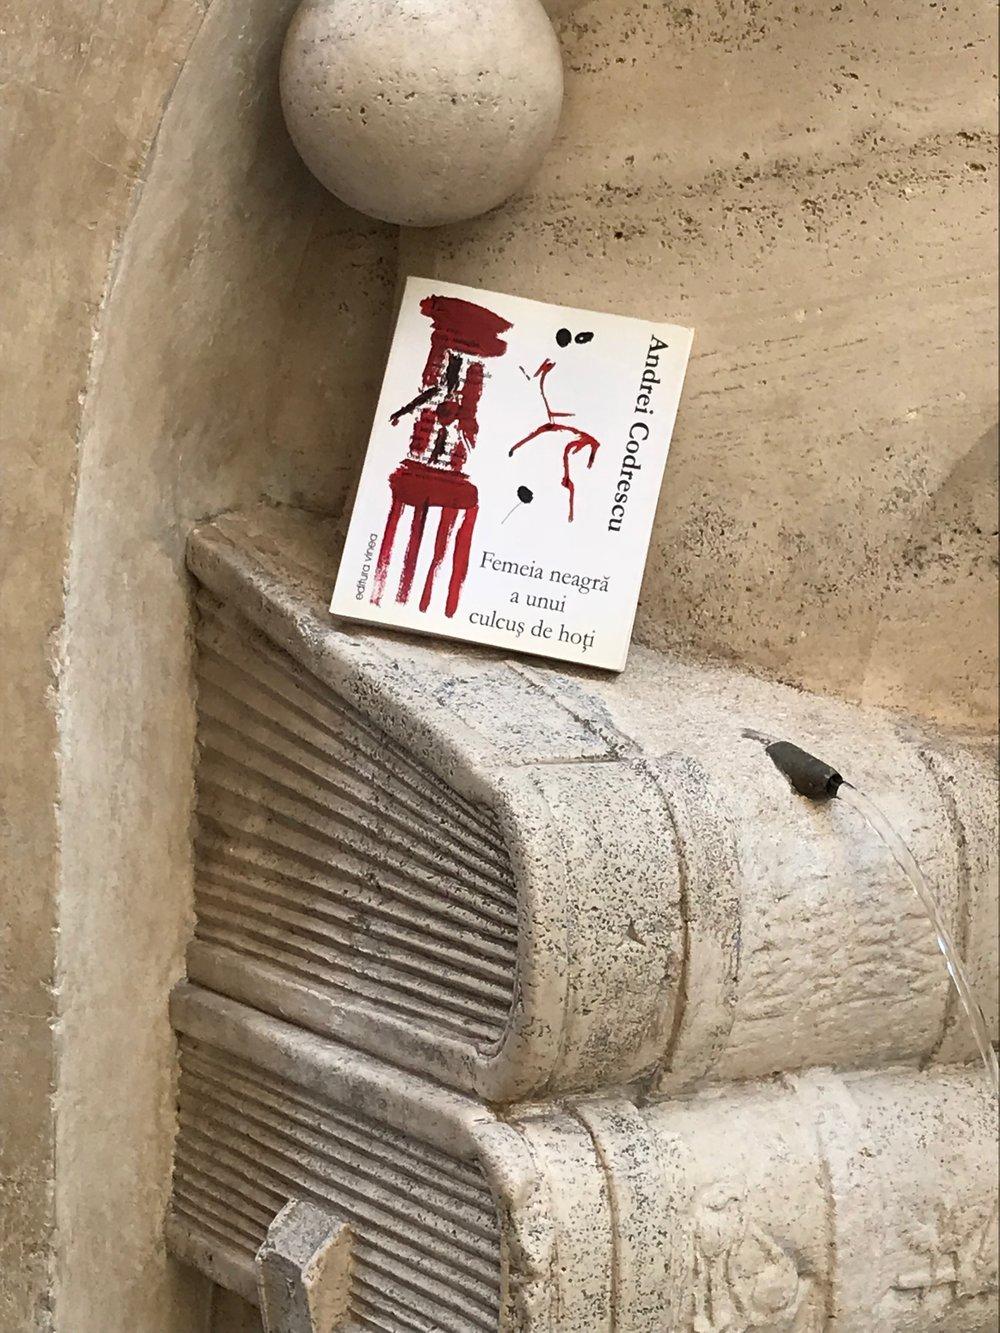 fontana de a sapienza_w Codrescu book_TOP.JPG